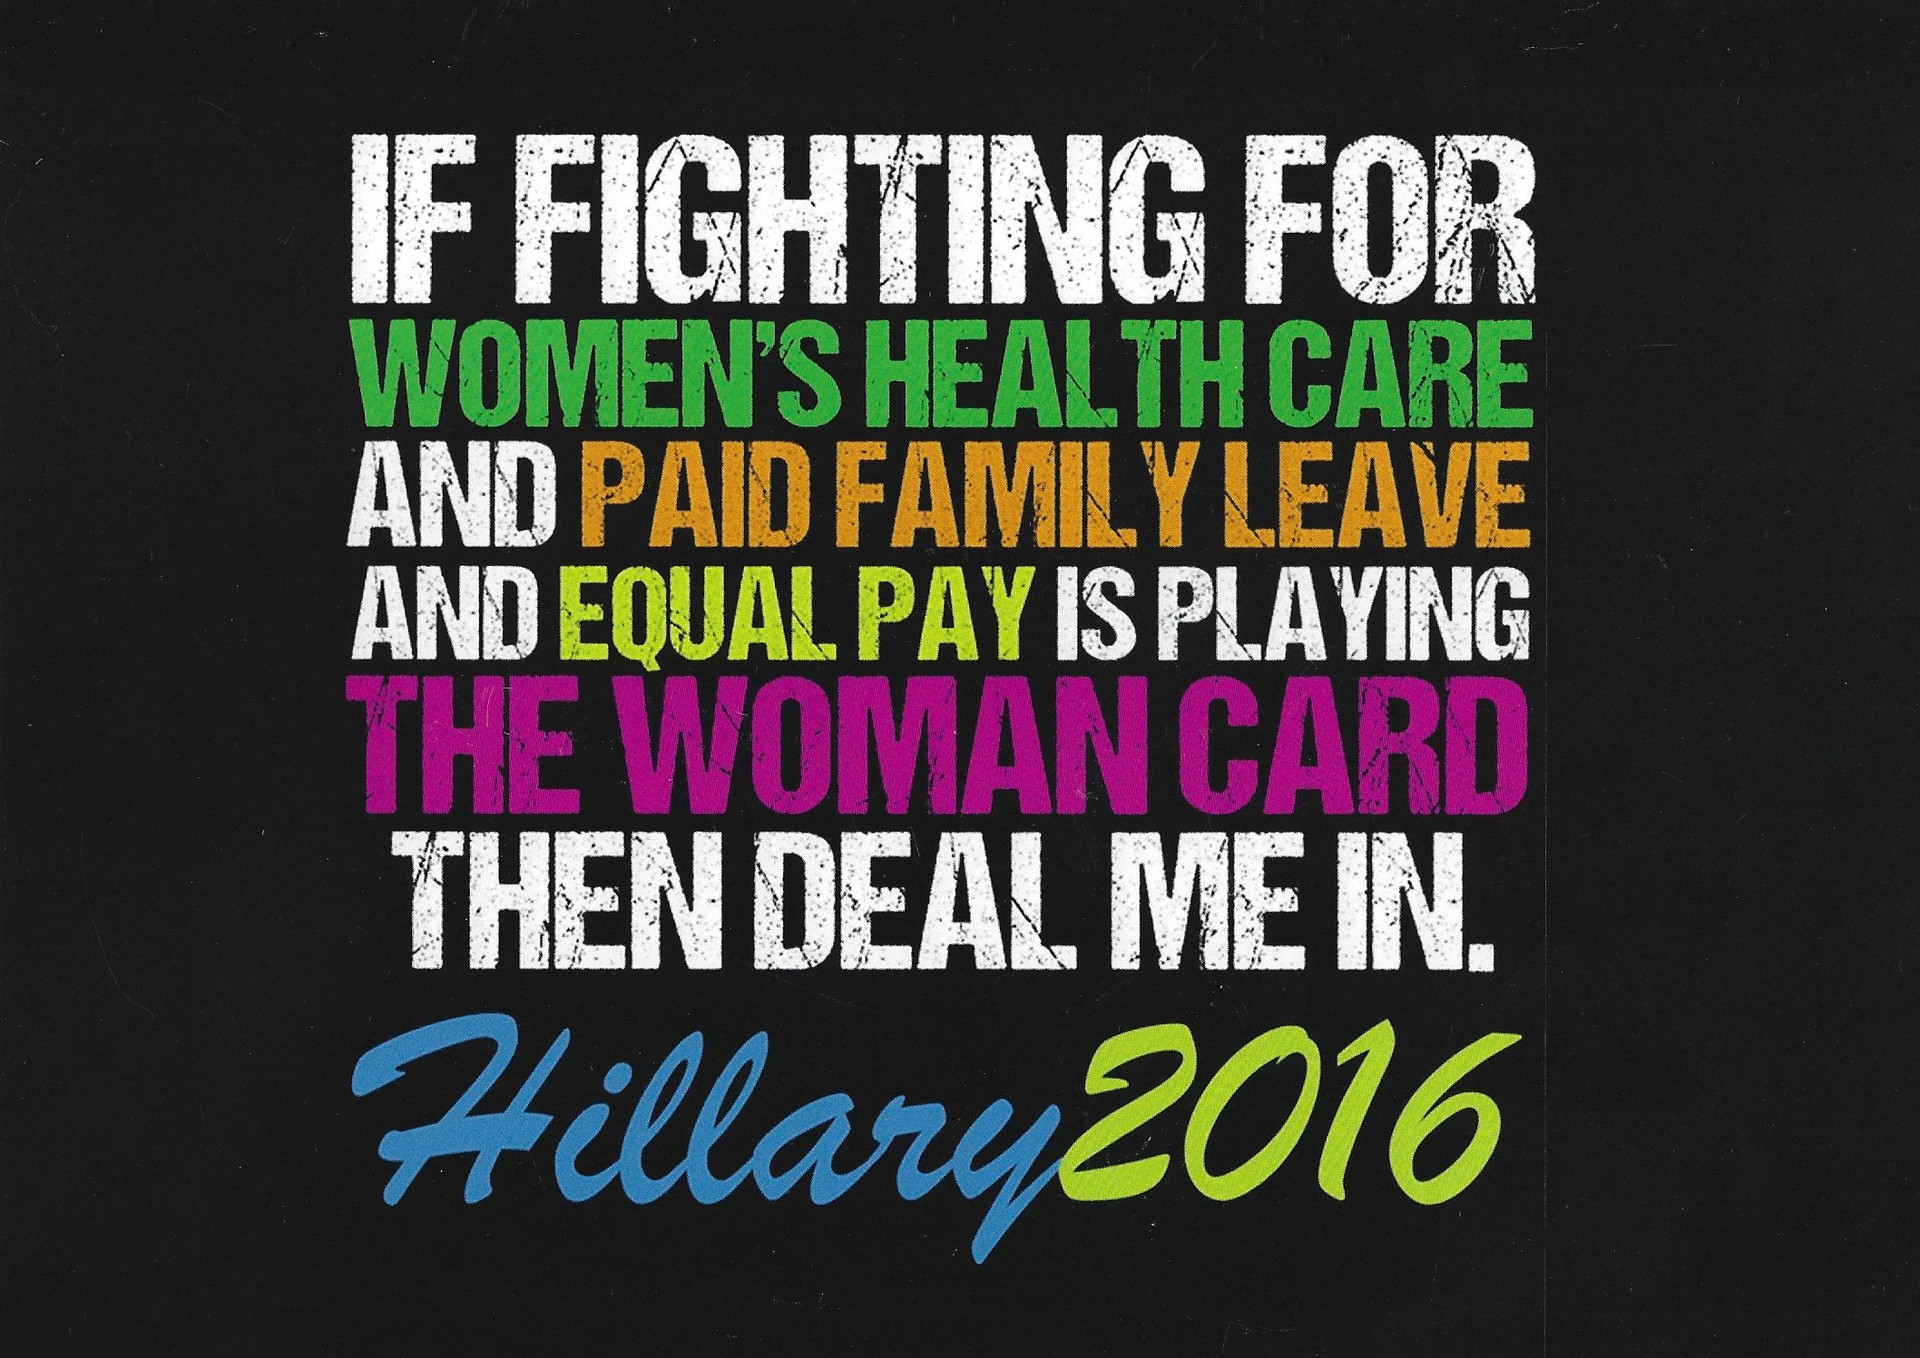 The Woman Card (Hillary)